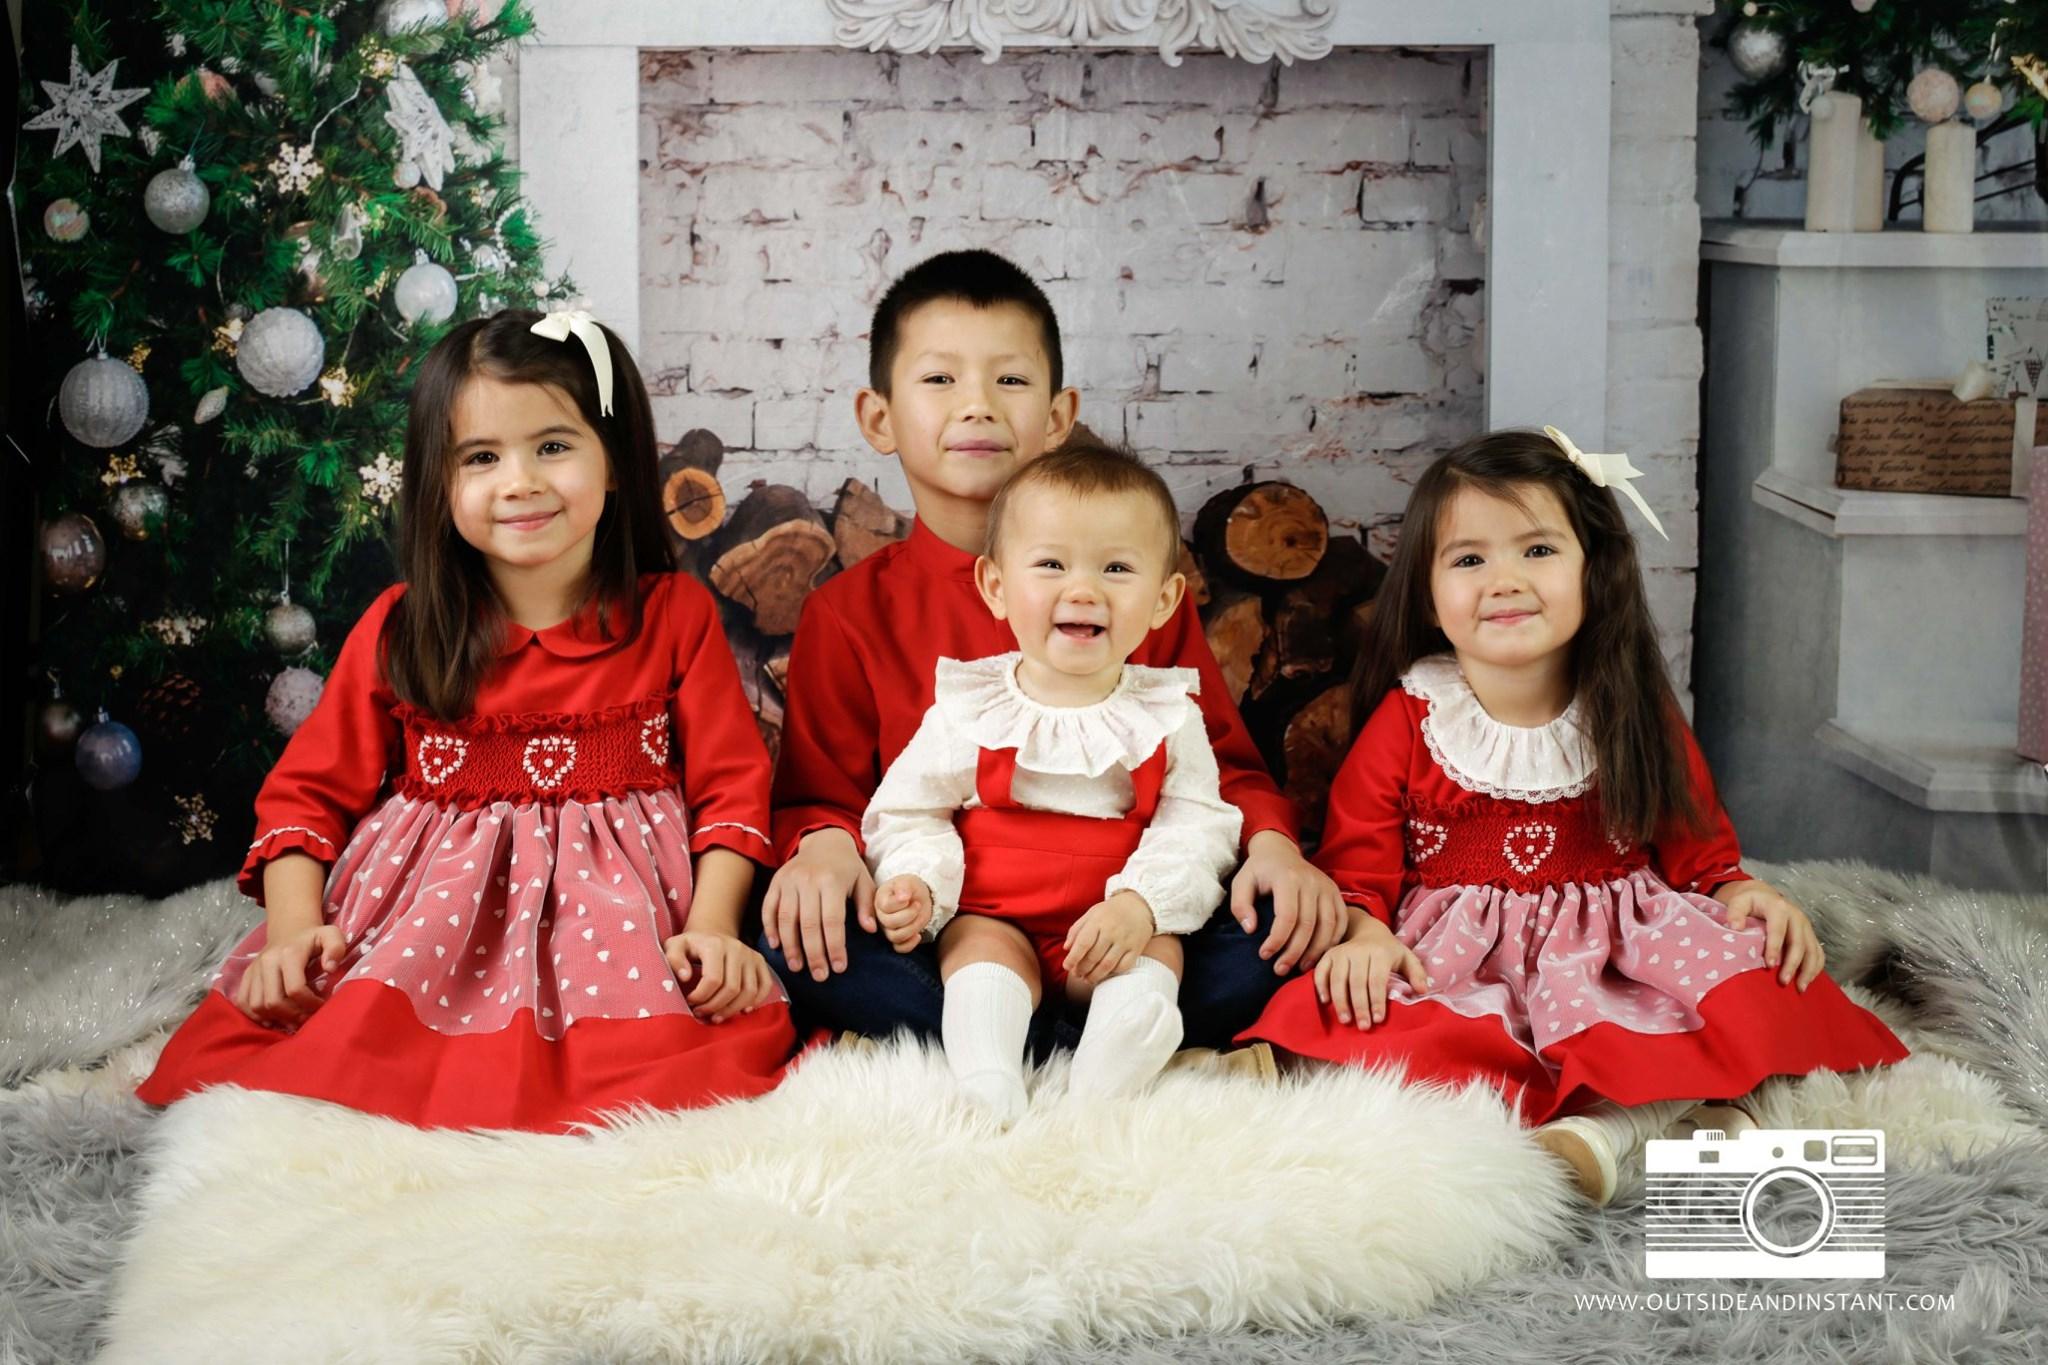 Christmas Pop up photography studio